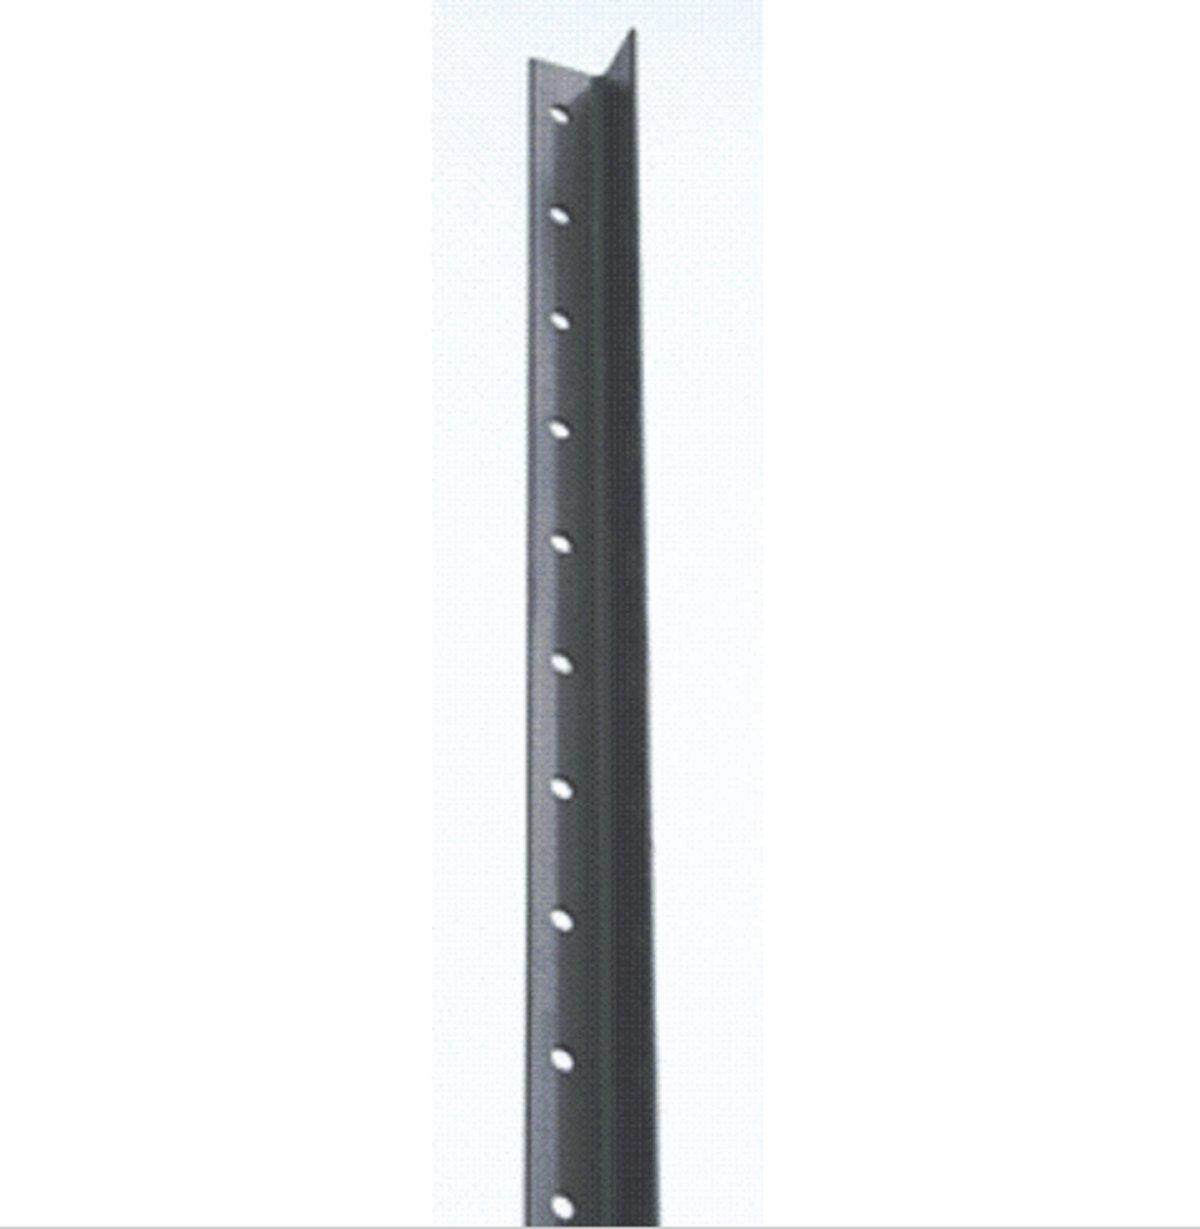 USA Premium Store 10 Steel Angle Black 8ft Fence Posts Deer Garden Posts by USA Premium Store